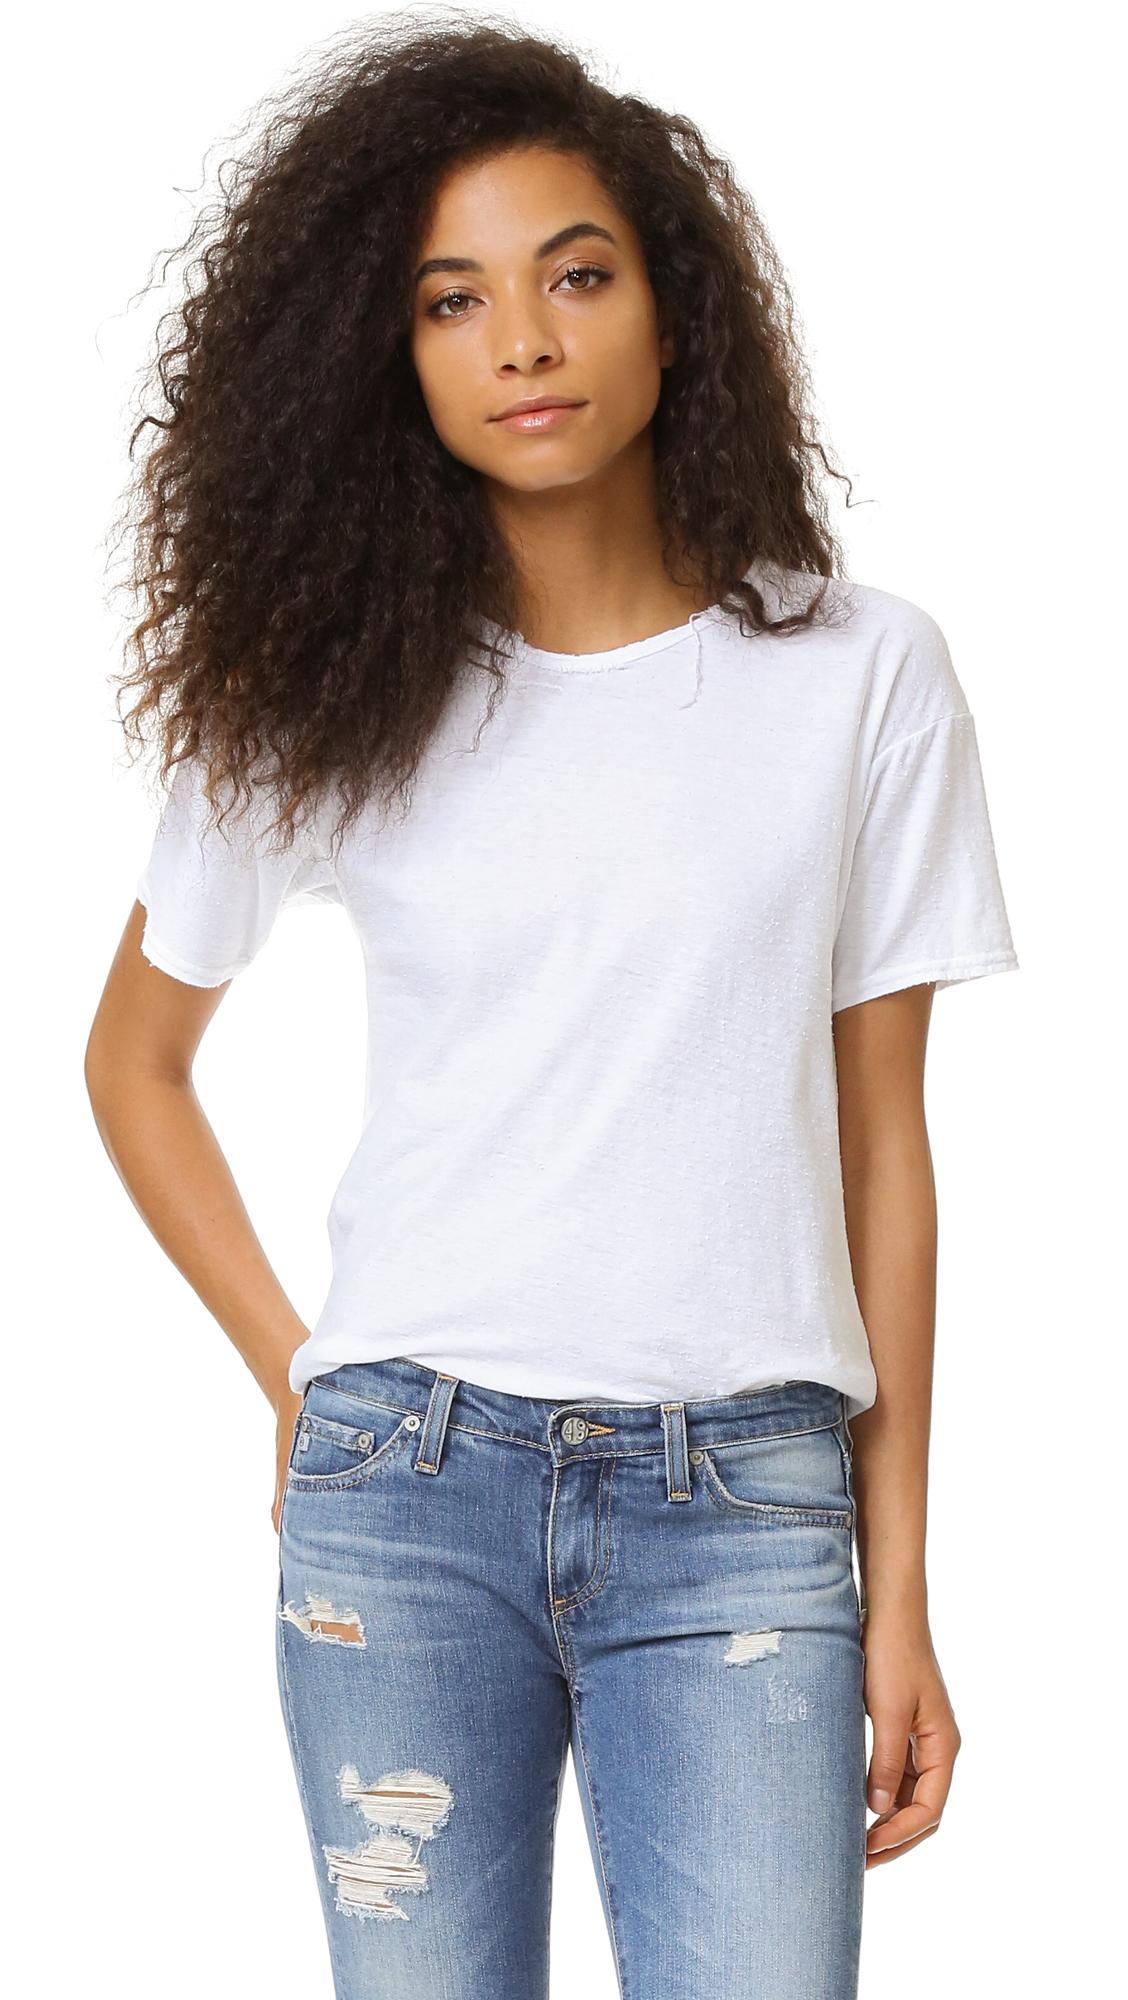 Citizens of Humanity Premium Vintage Esmay T-Shirt - Vintage White